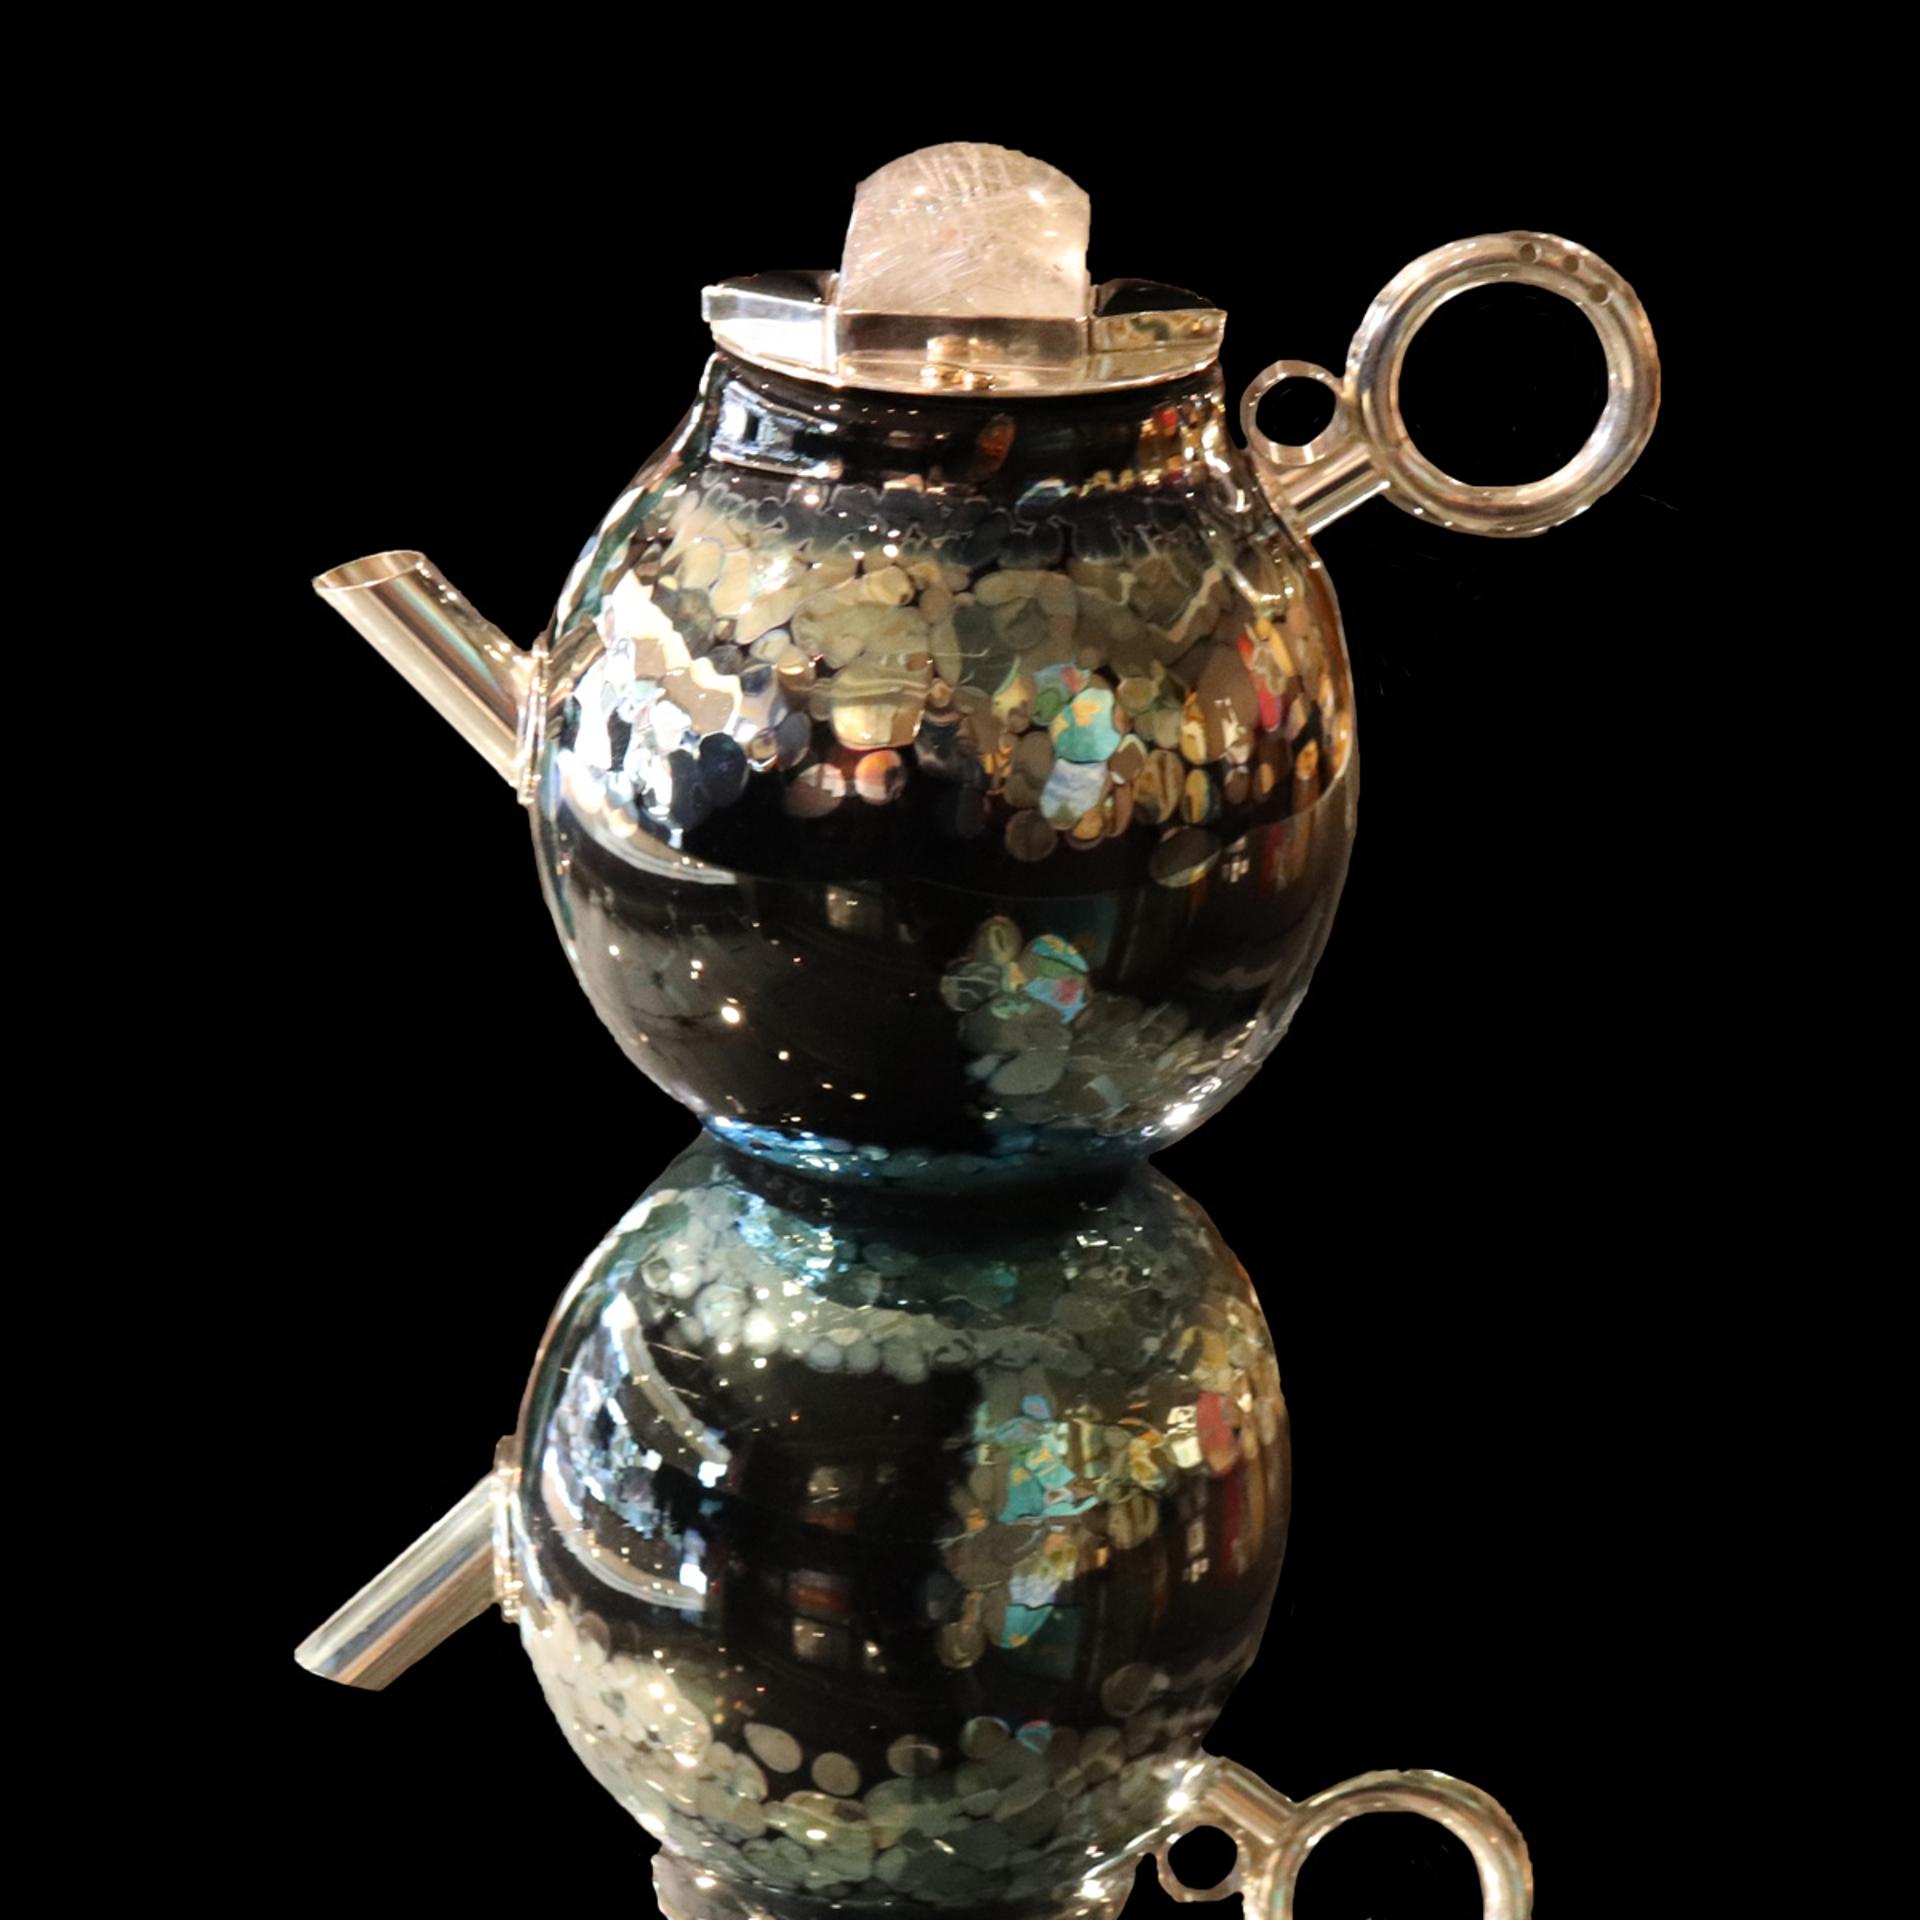 Teapot #1 by Elaine Hyde